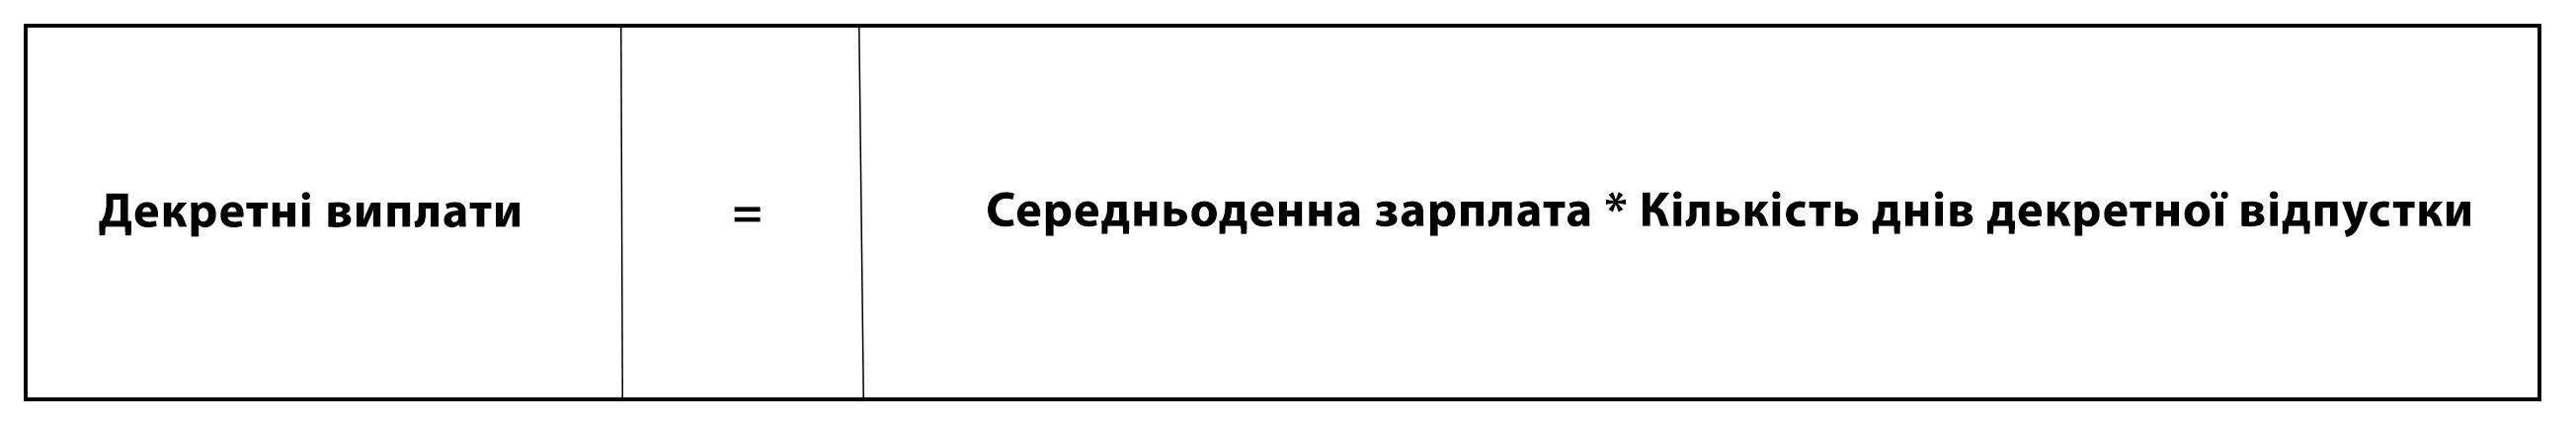 калькулятор декретних